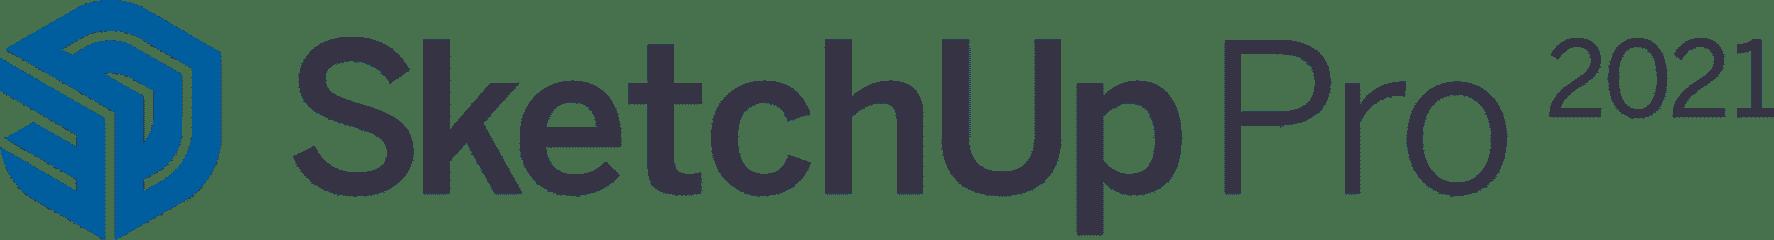 SketchUp Pro 2021 Horizontal RGB